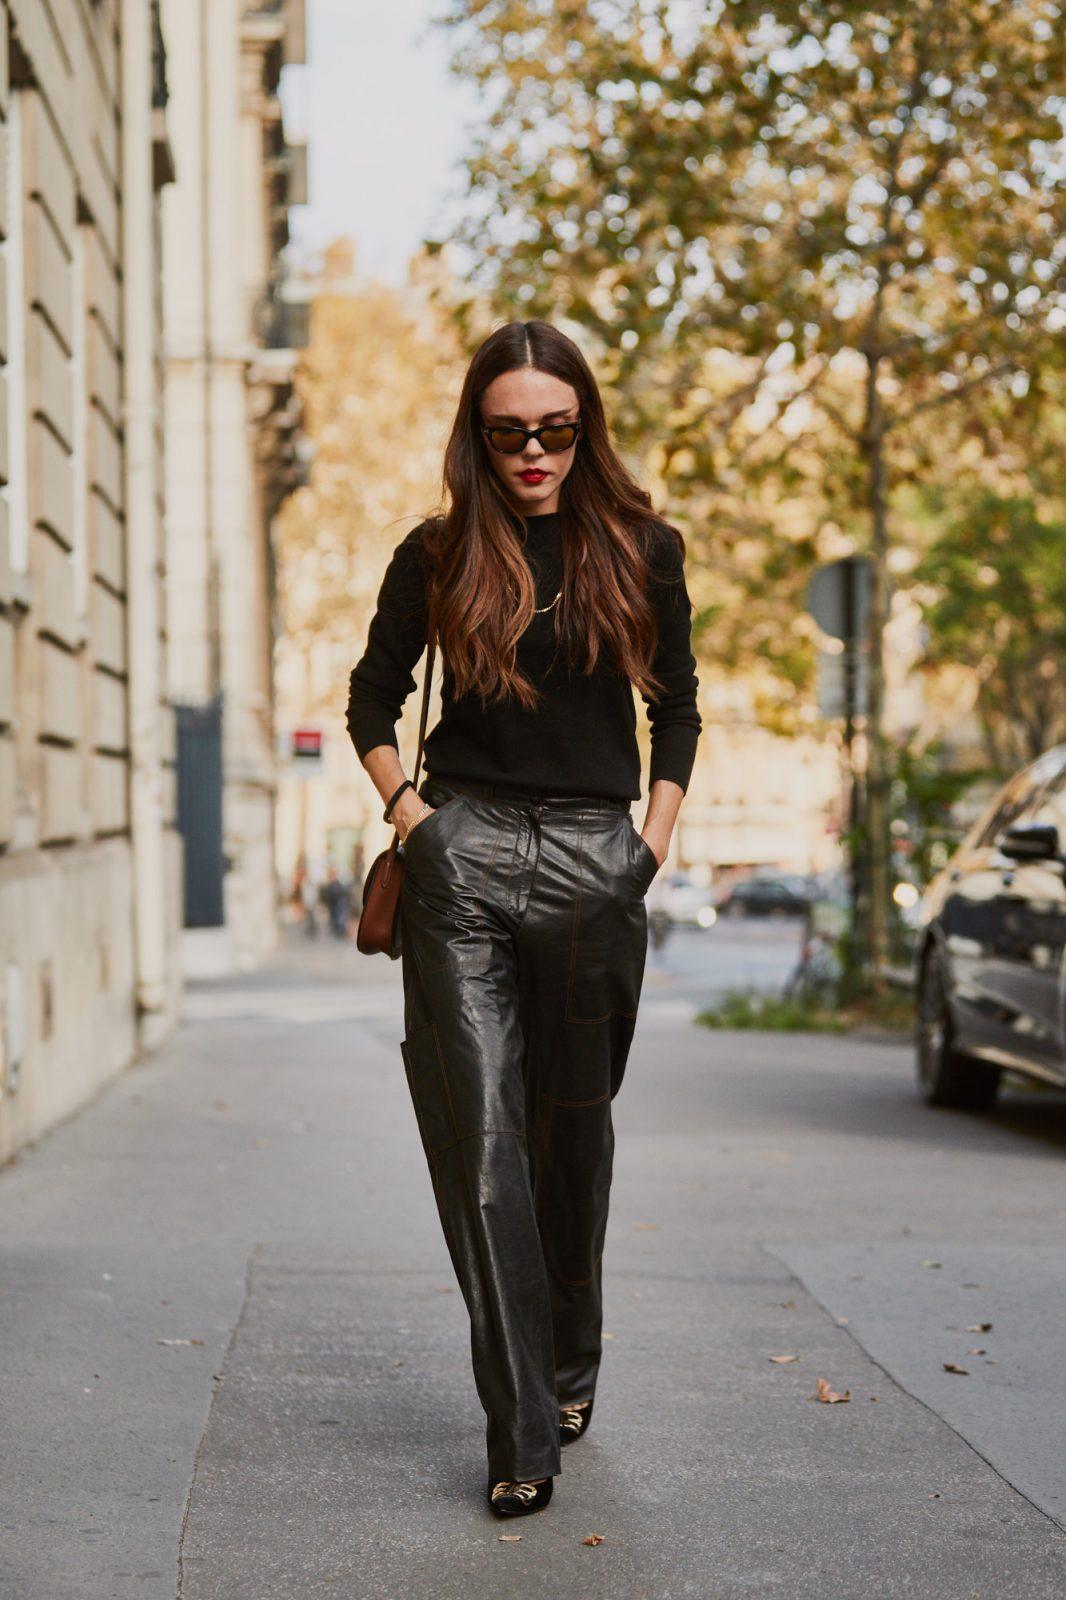 Slim black blouse with shiny charcoal pants